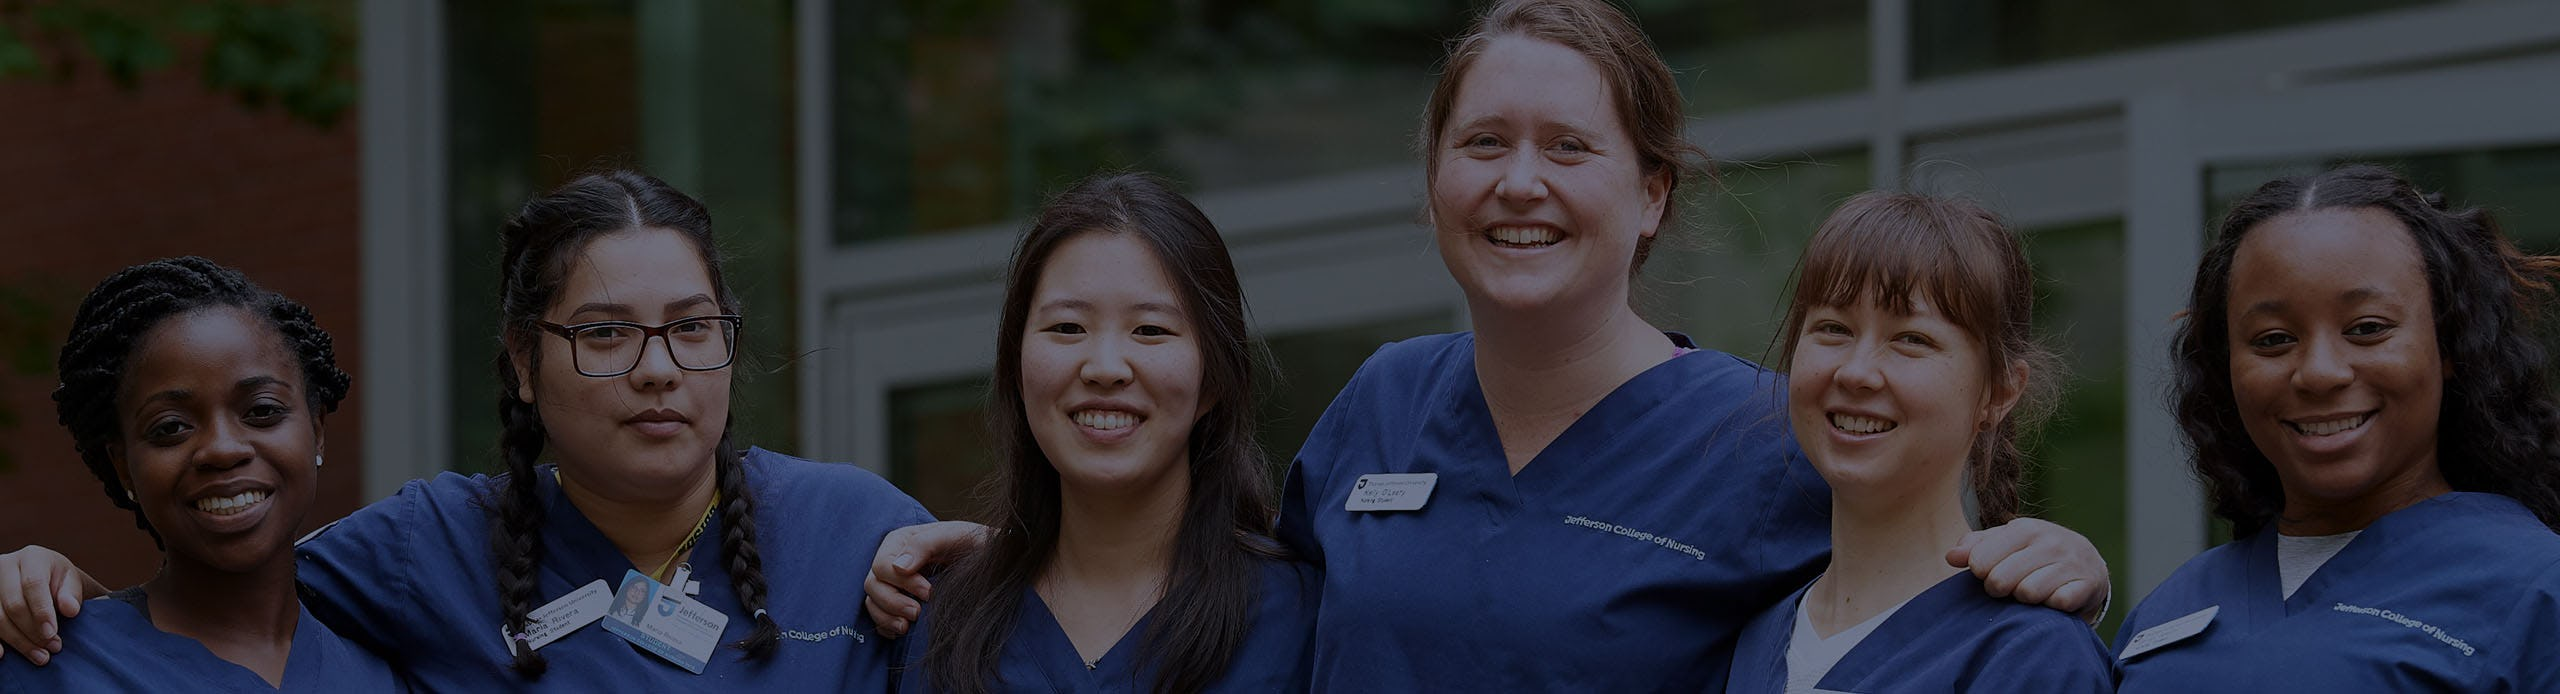 WatchBox Supporting Jefferson University  Hospital COVID-19 Funding